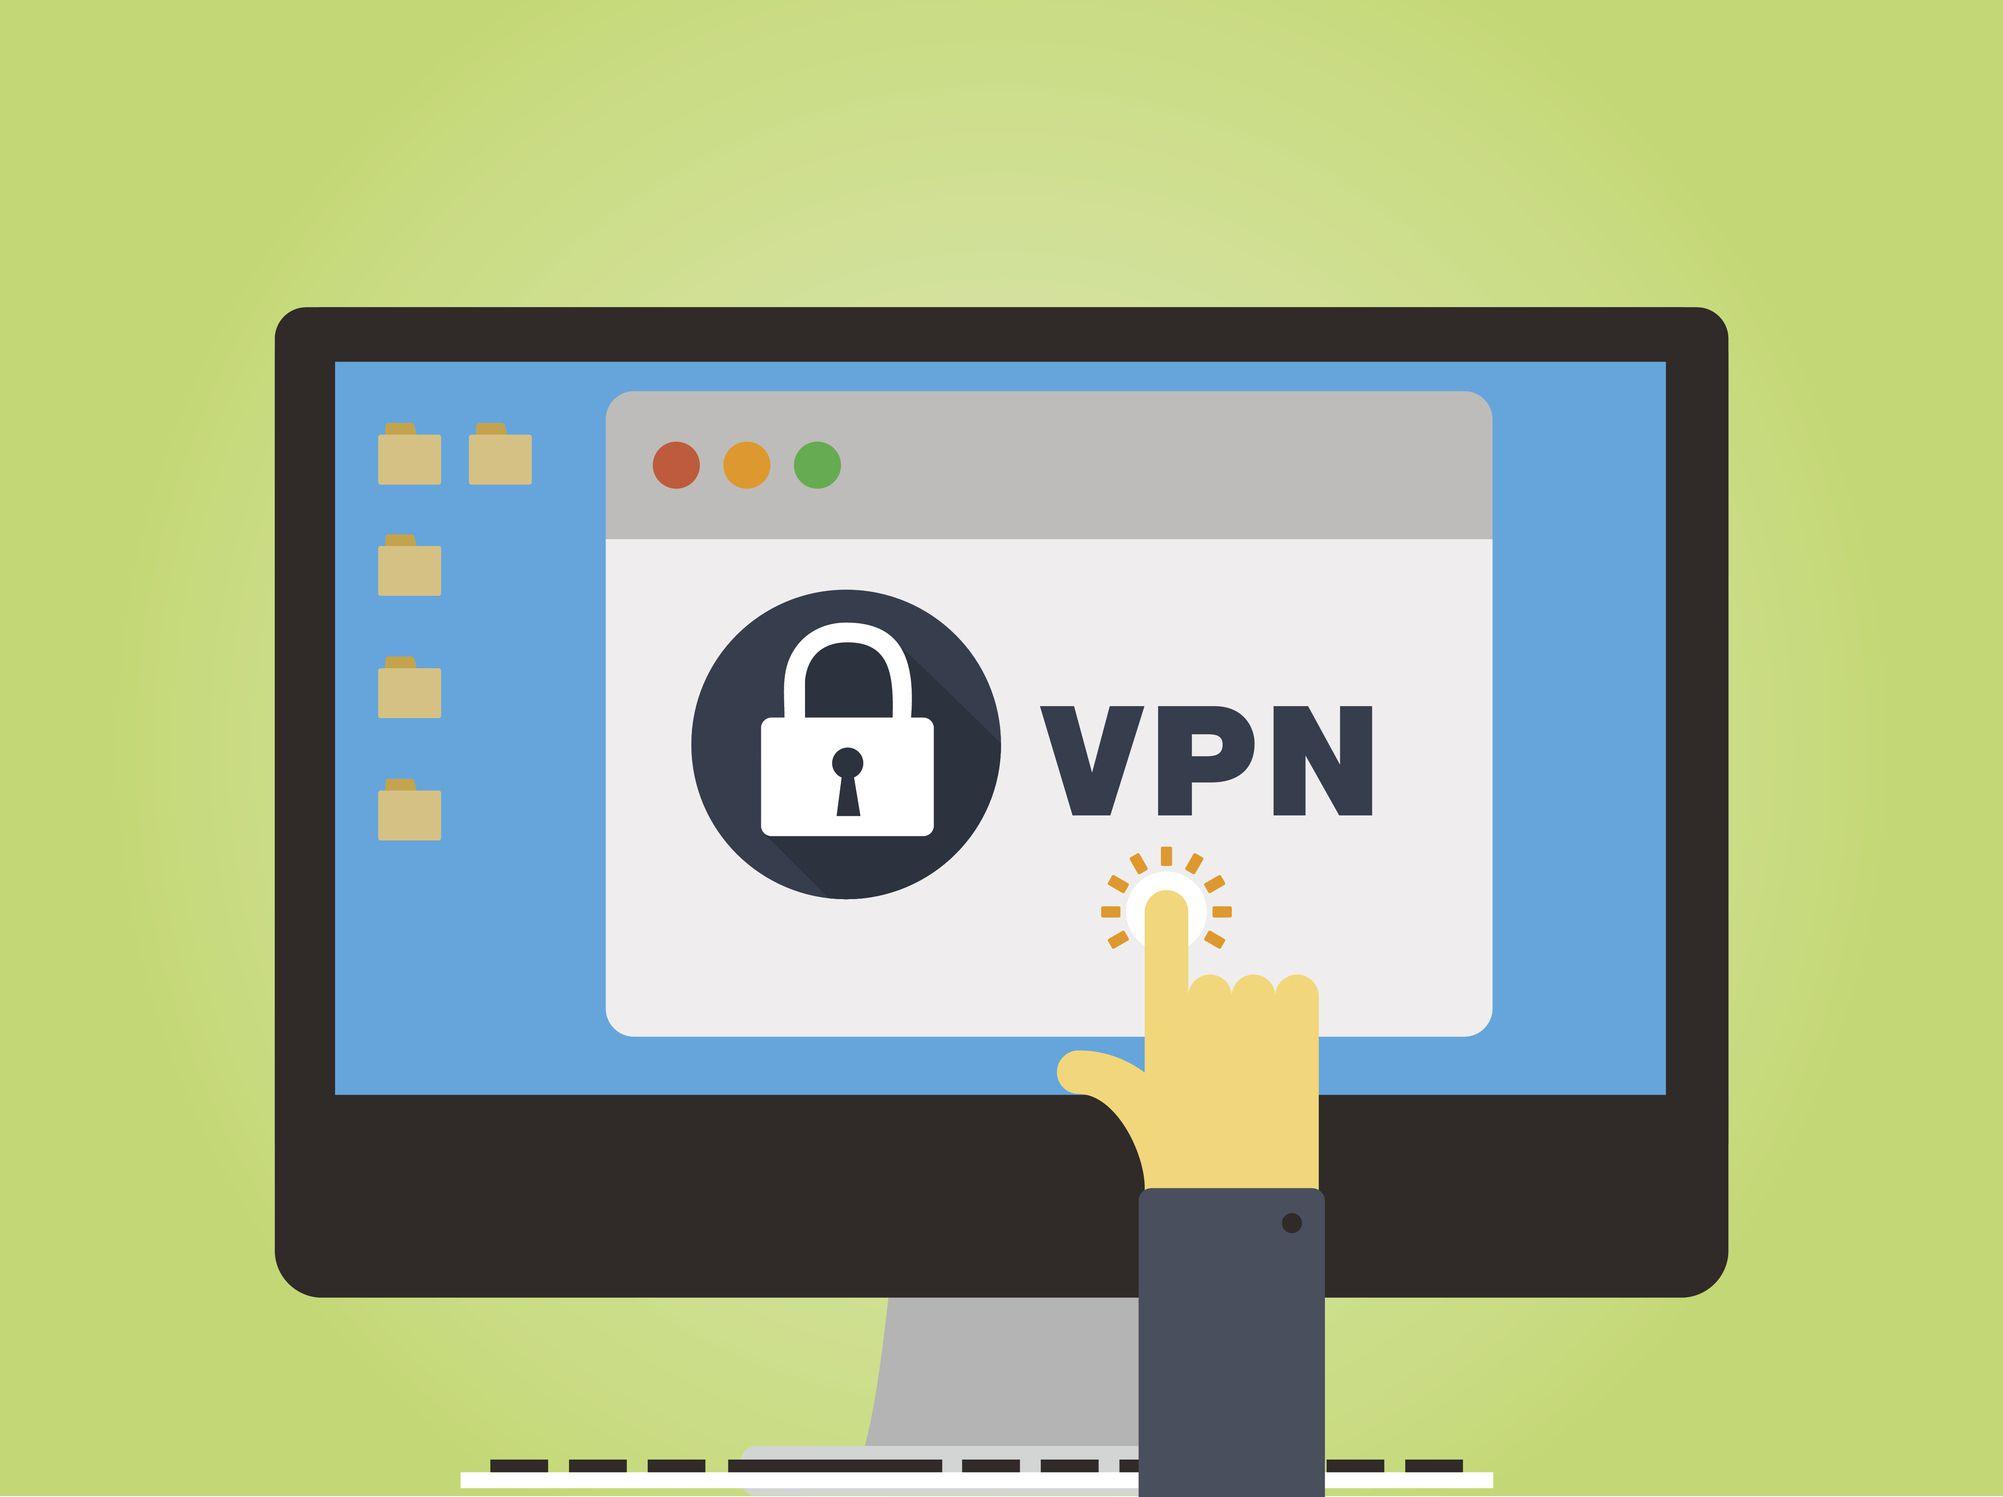 VPN opera